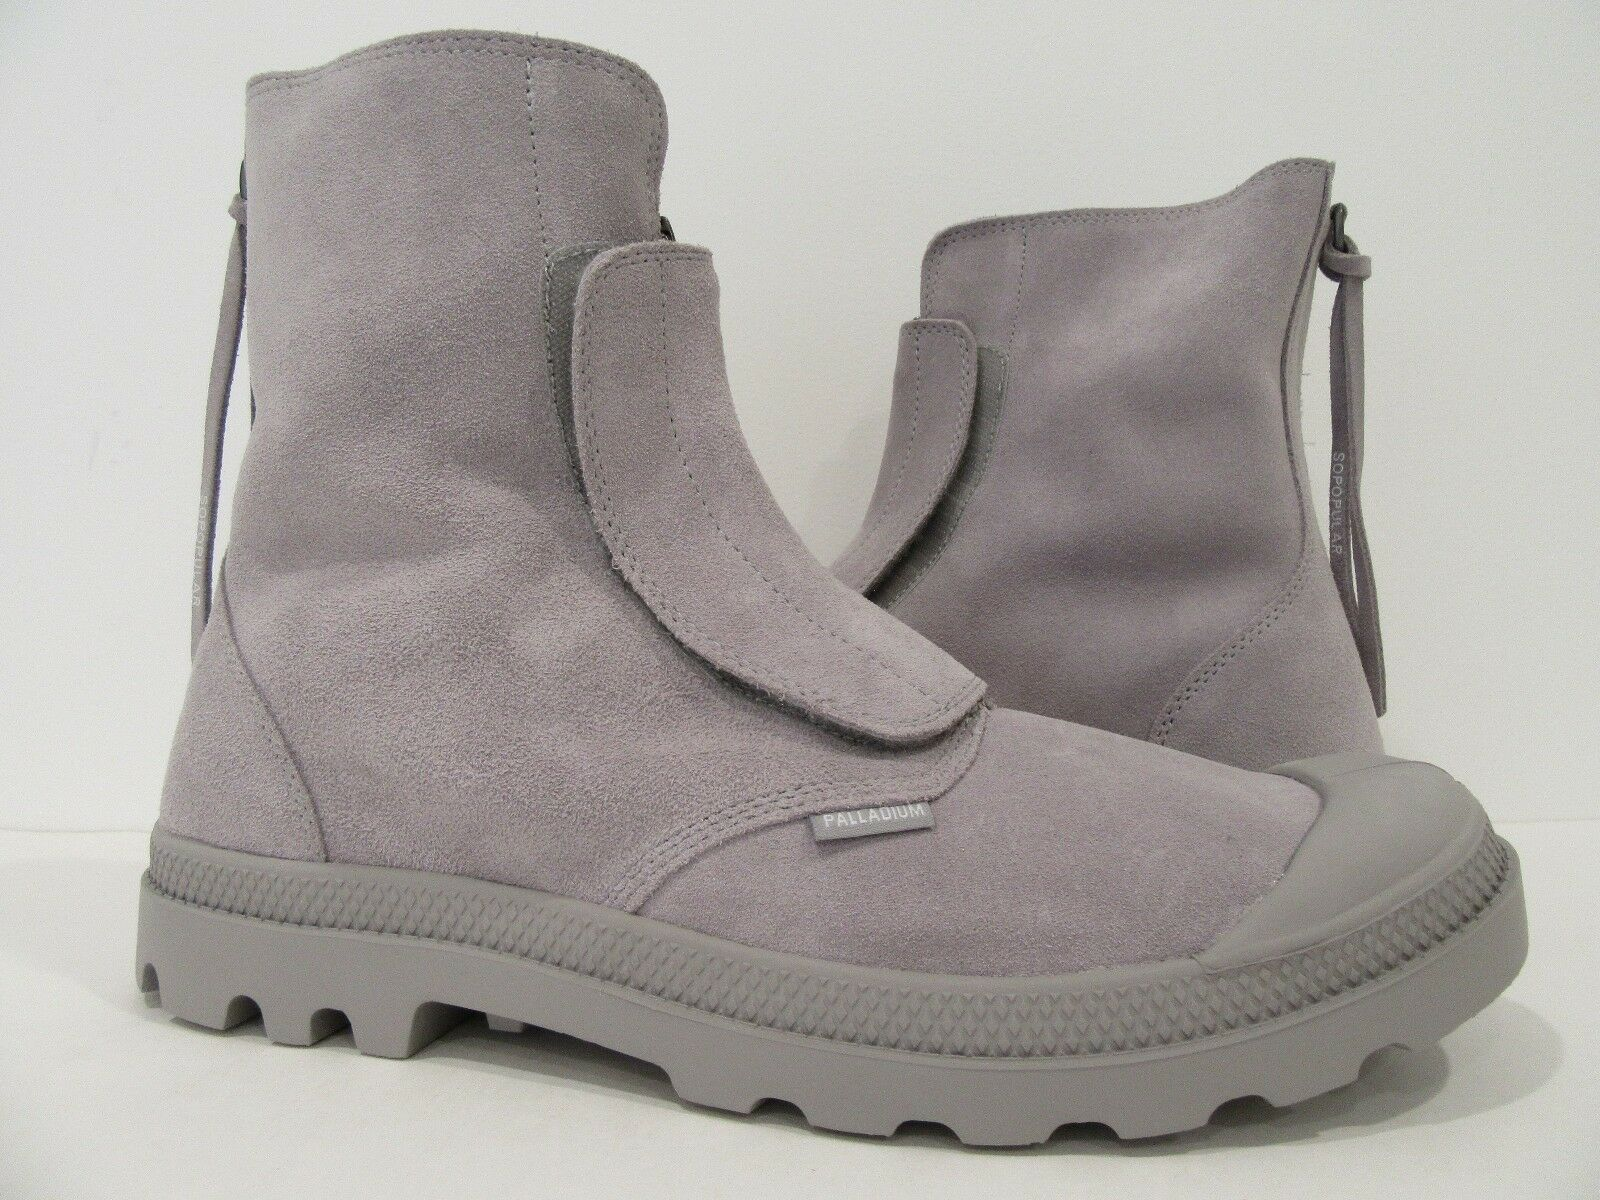 benvenuto per ordinare Palladium uomo Suede pampa hi sopopular Ankle Ankle Ankle stivali ash bianca  acquista marca